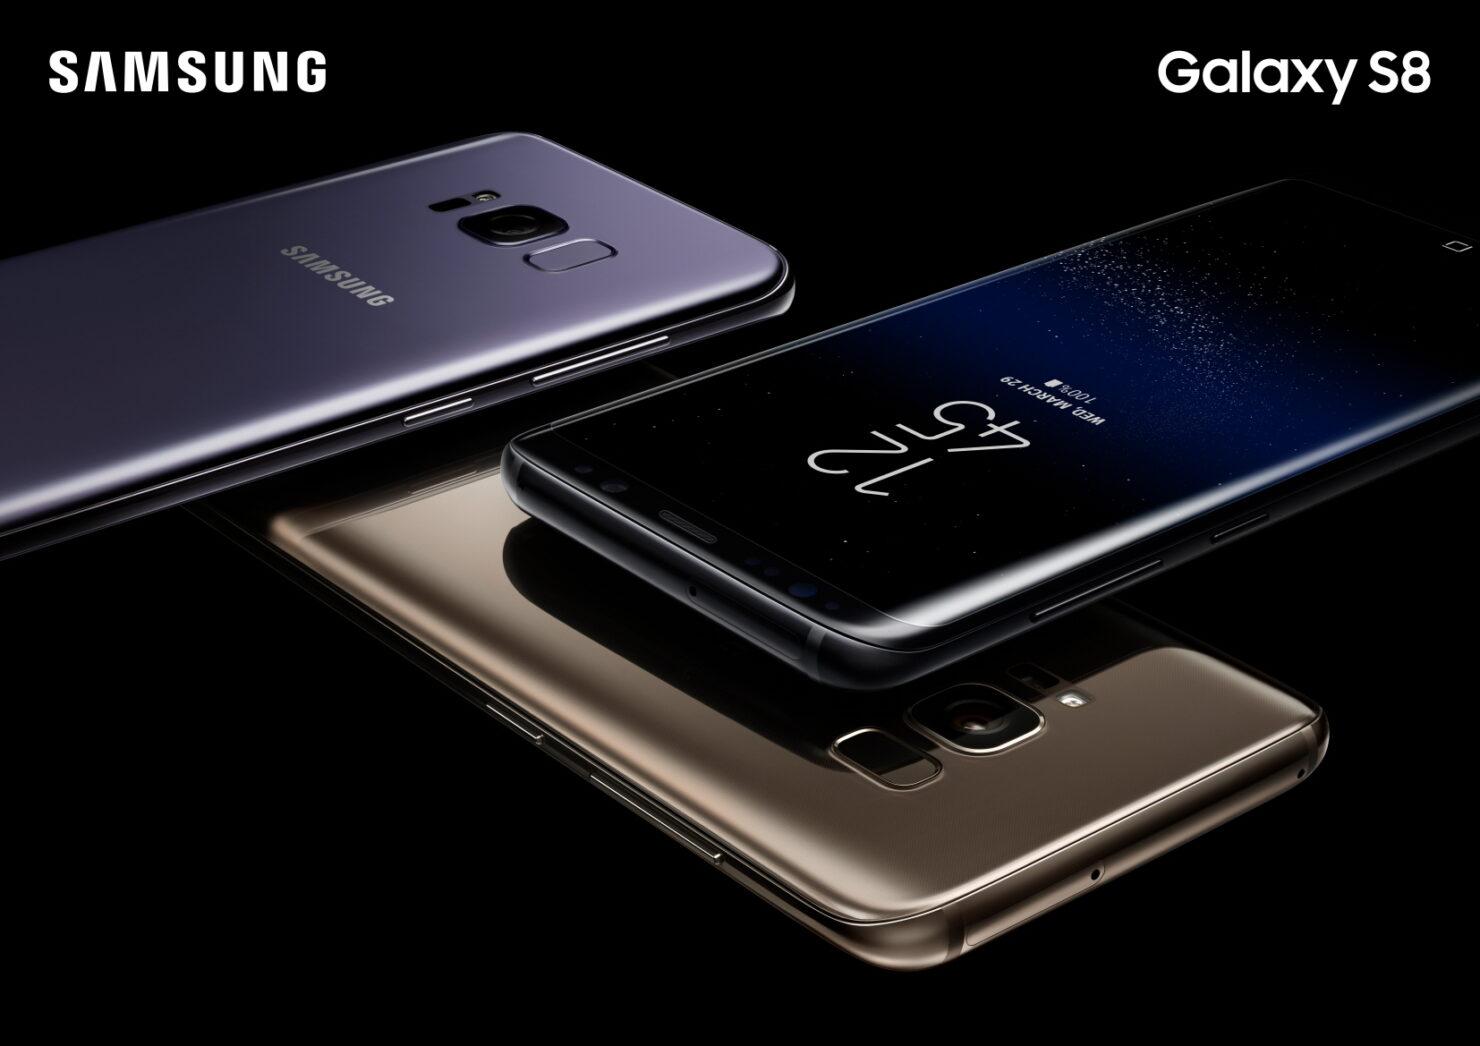 Galaxy S8 & Galaxy S8+ best selling phones